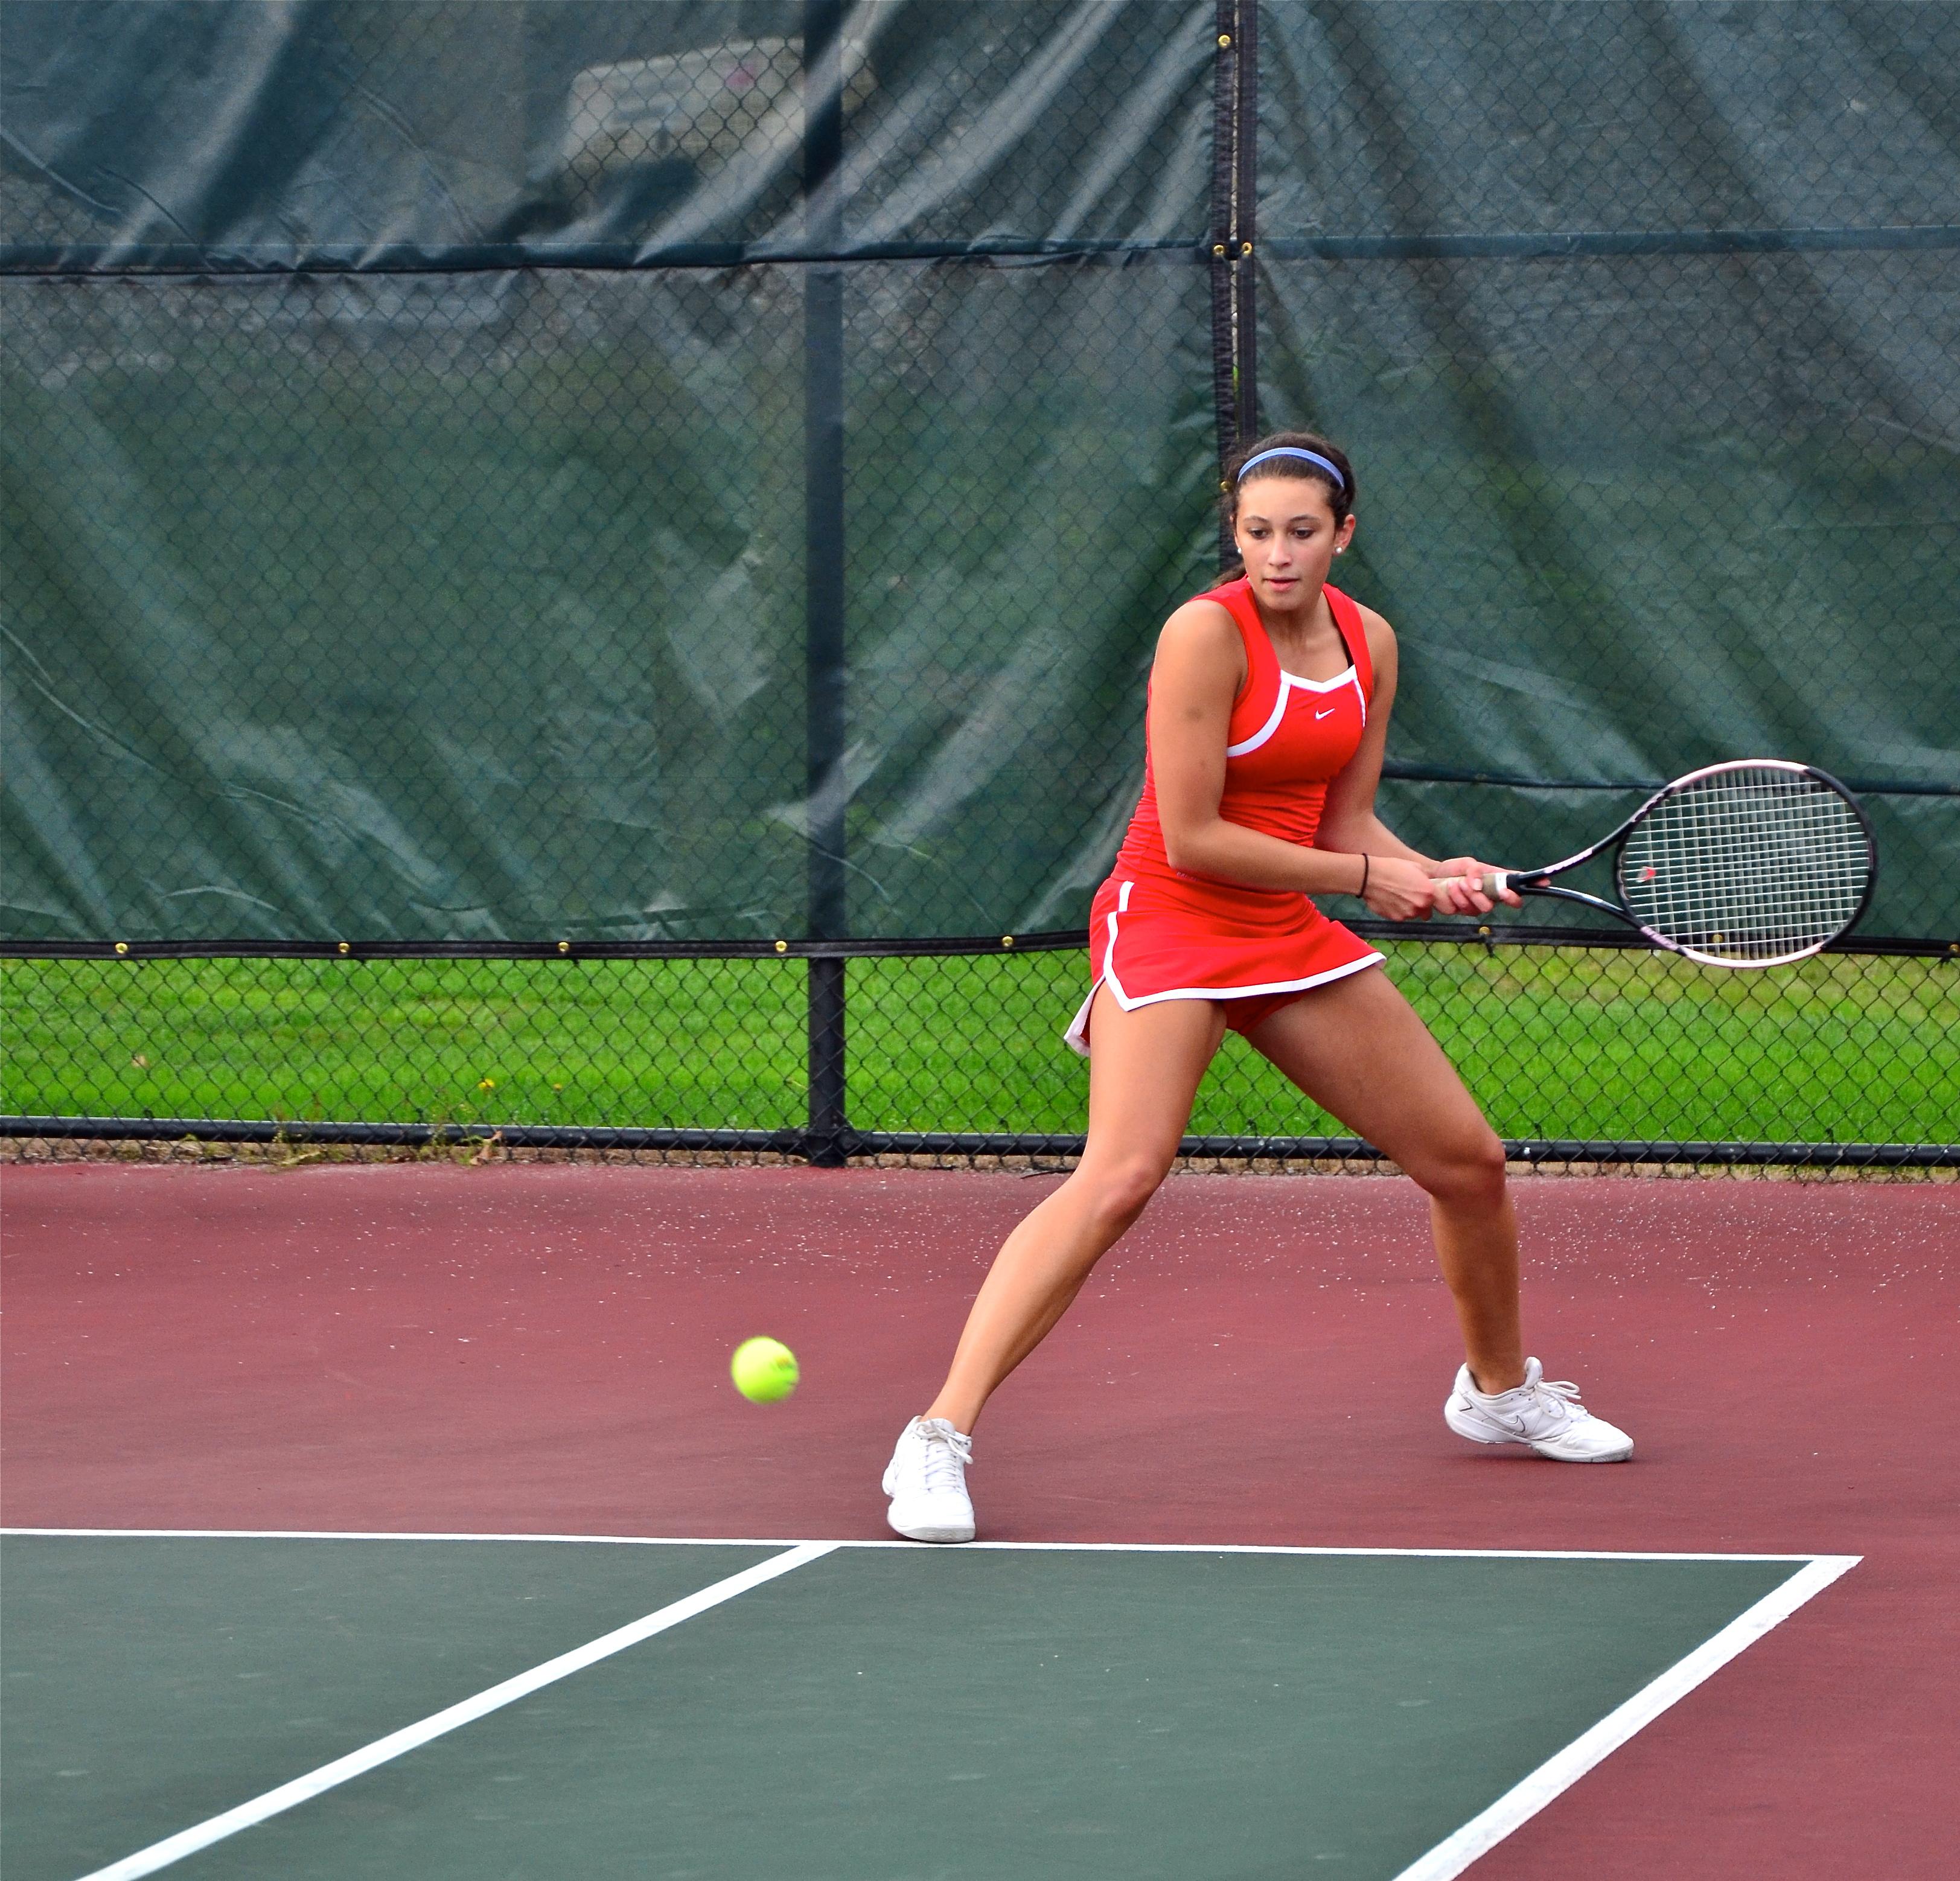 action sports suco tanaka tennis kei thestatetimes